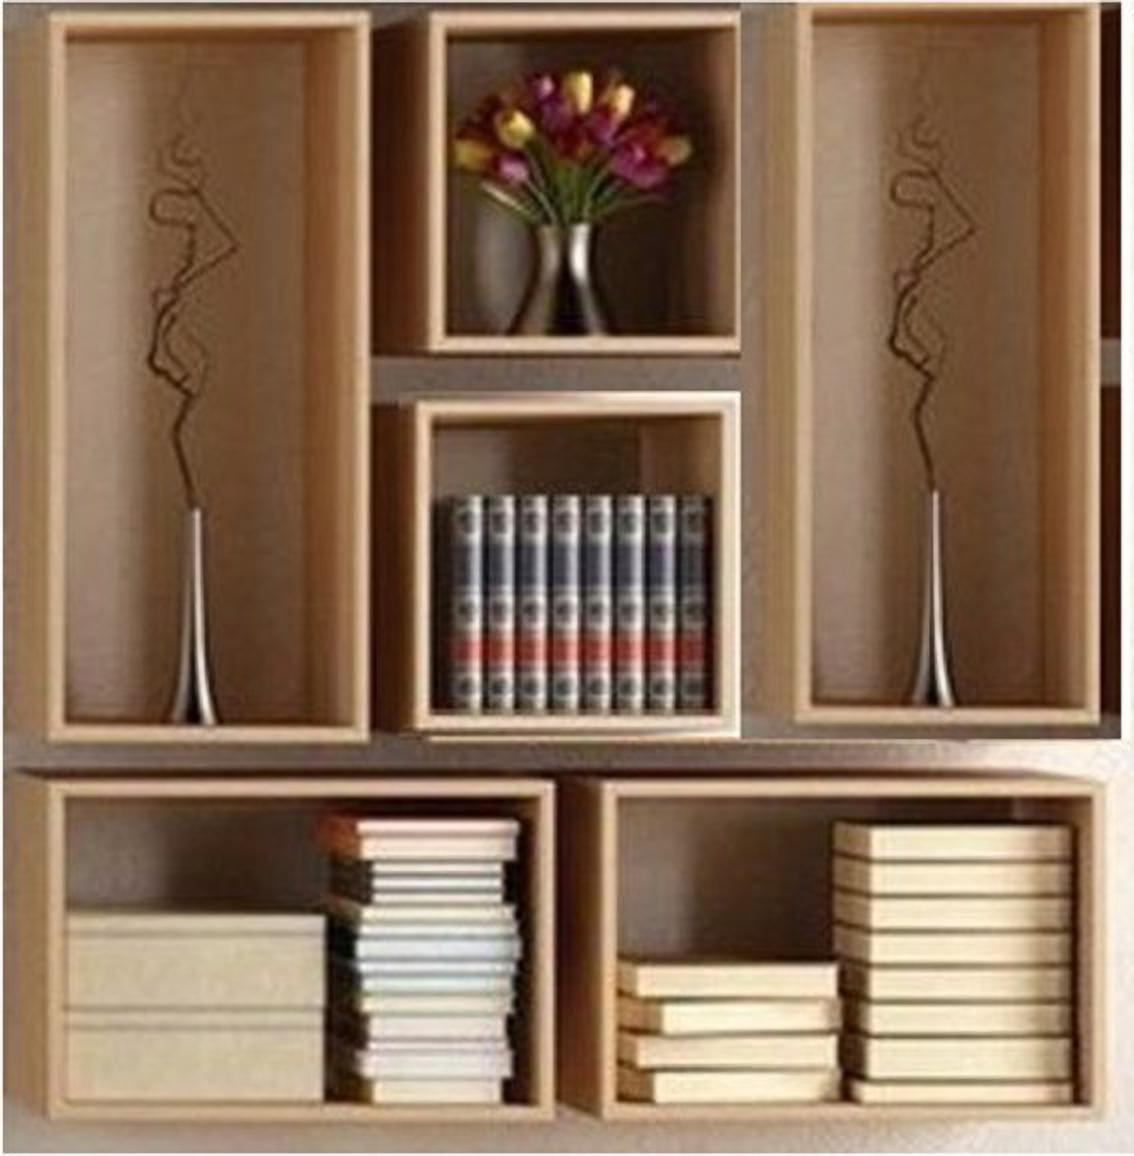 onlinecraft wooden wall book rack shelf  c2470  brown